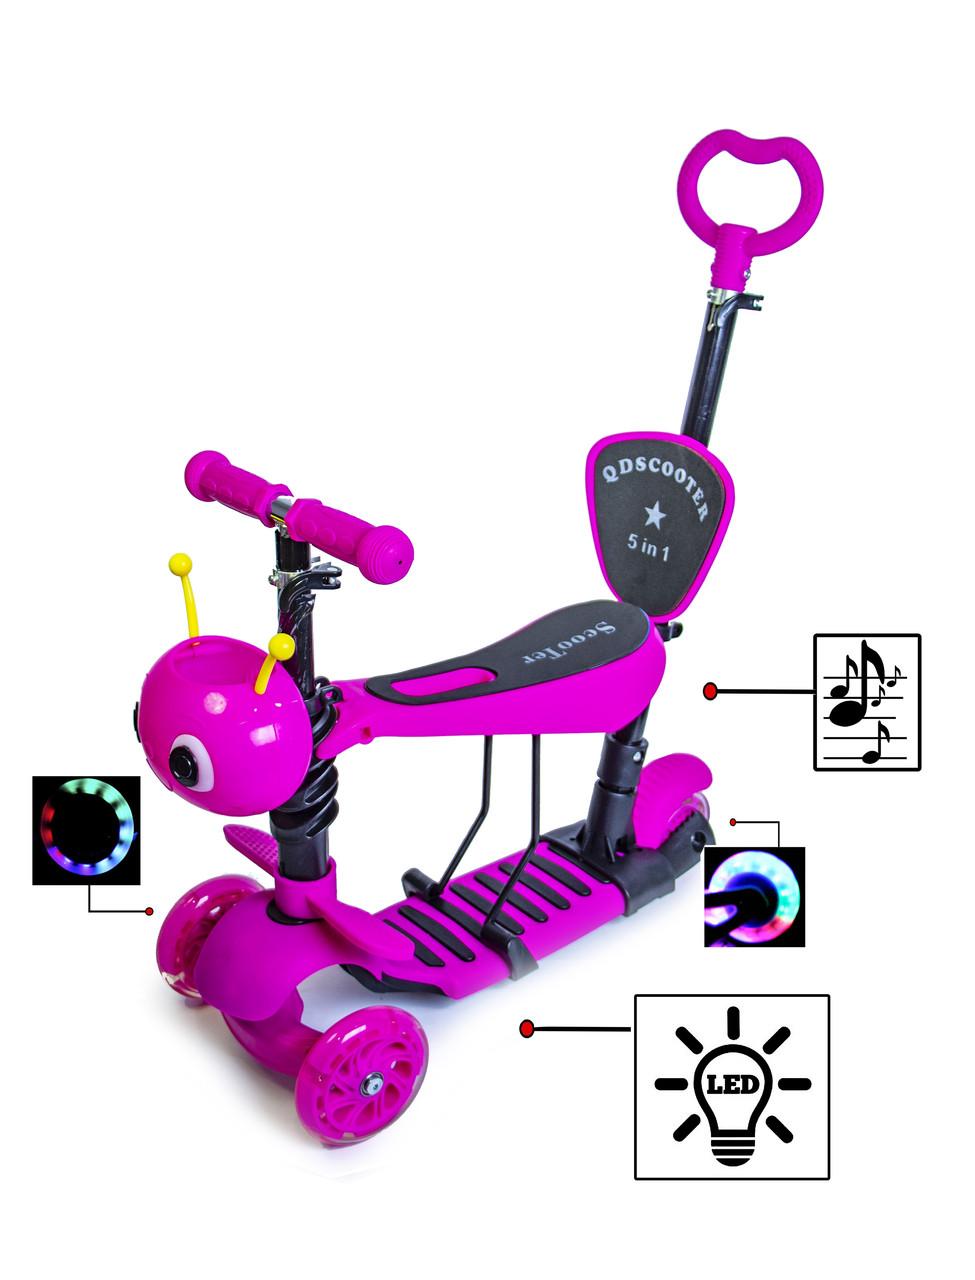 "+Подарок Самокат Scooter ""Пчелка"" 5in1. Pink. со светом и музыкой!"